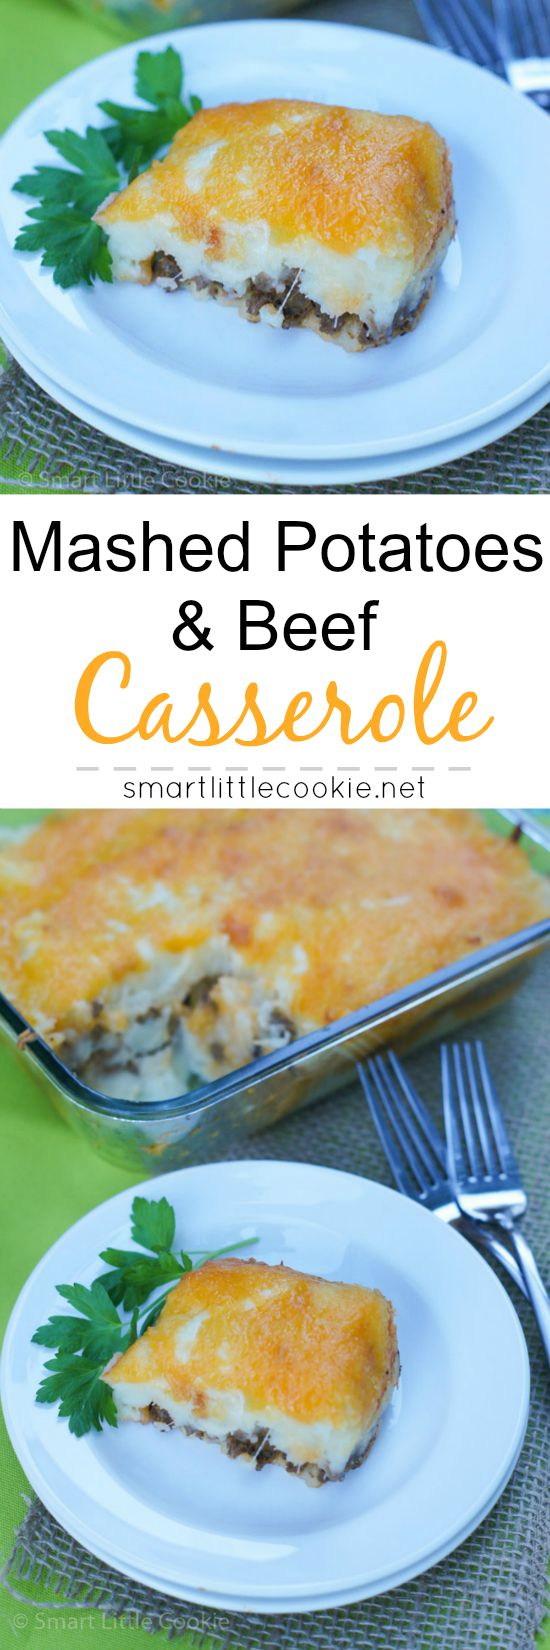 Mashed Potatoes and Beef Casserole |smartlittlecookie.net